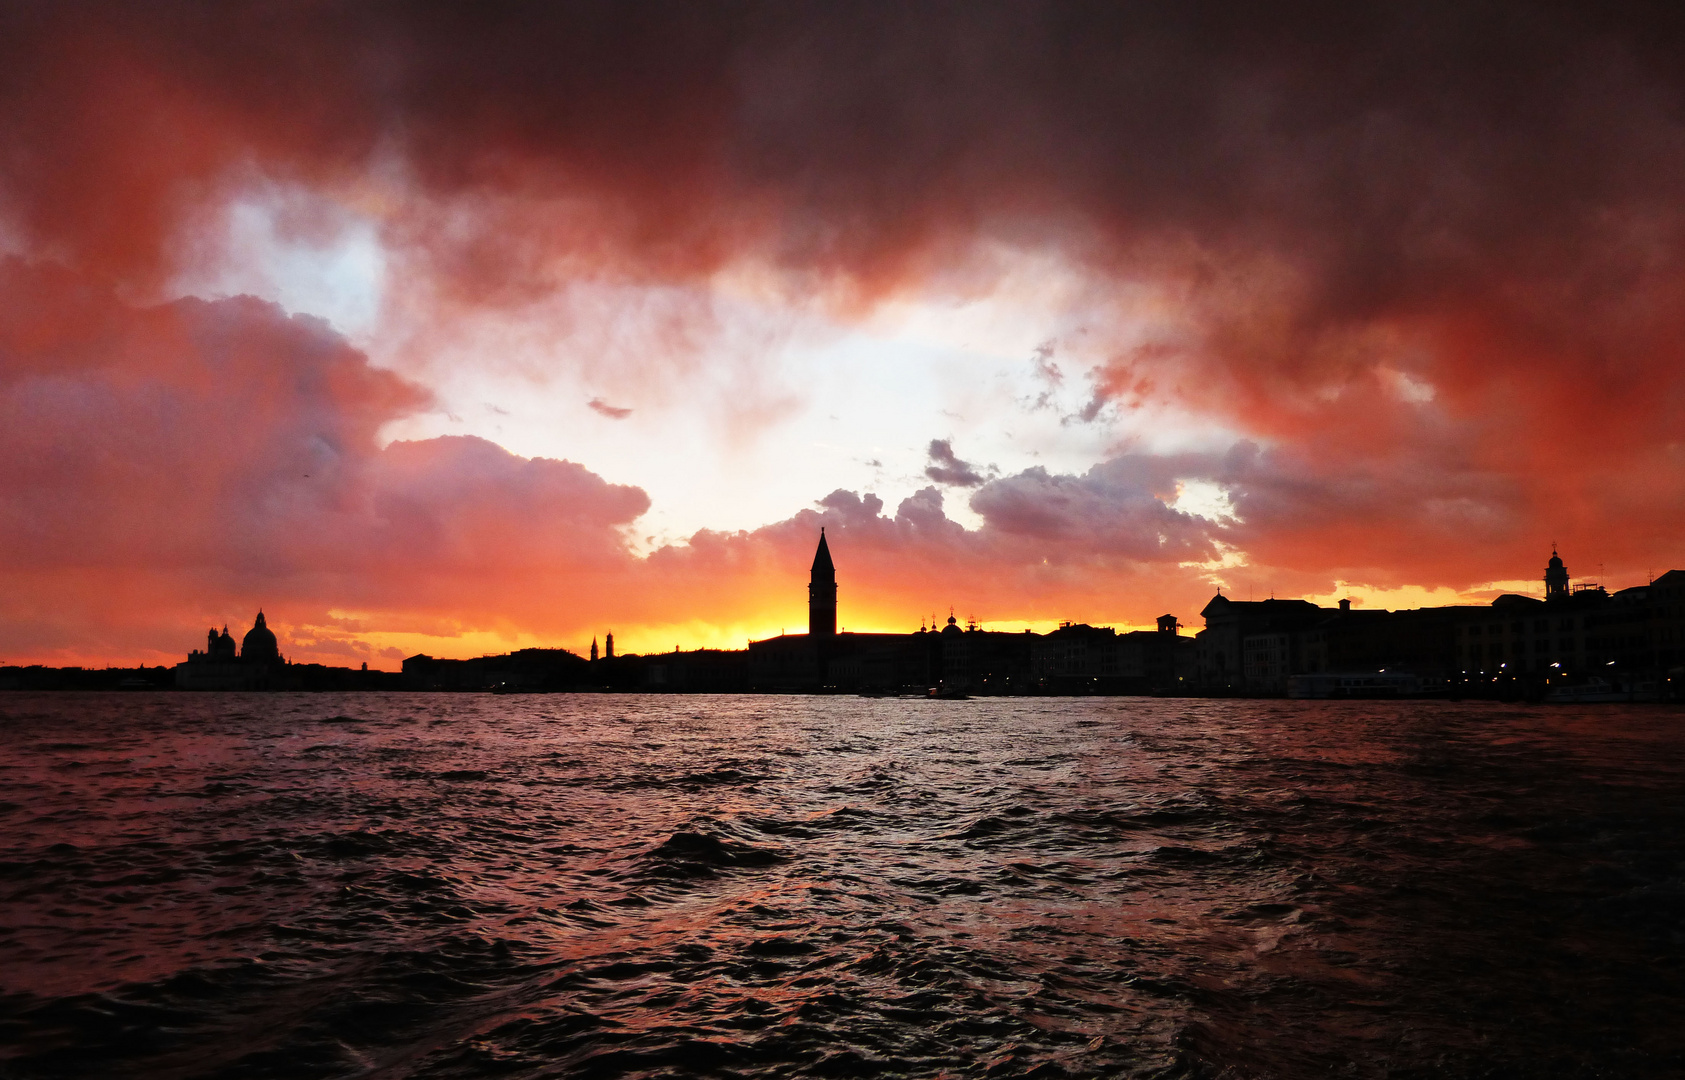 Sonneruntergang Venedig